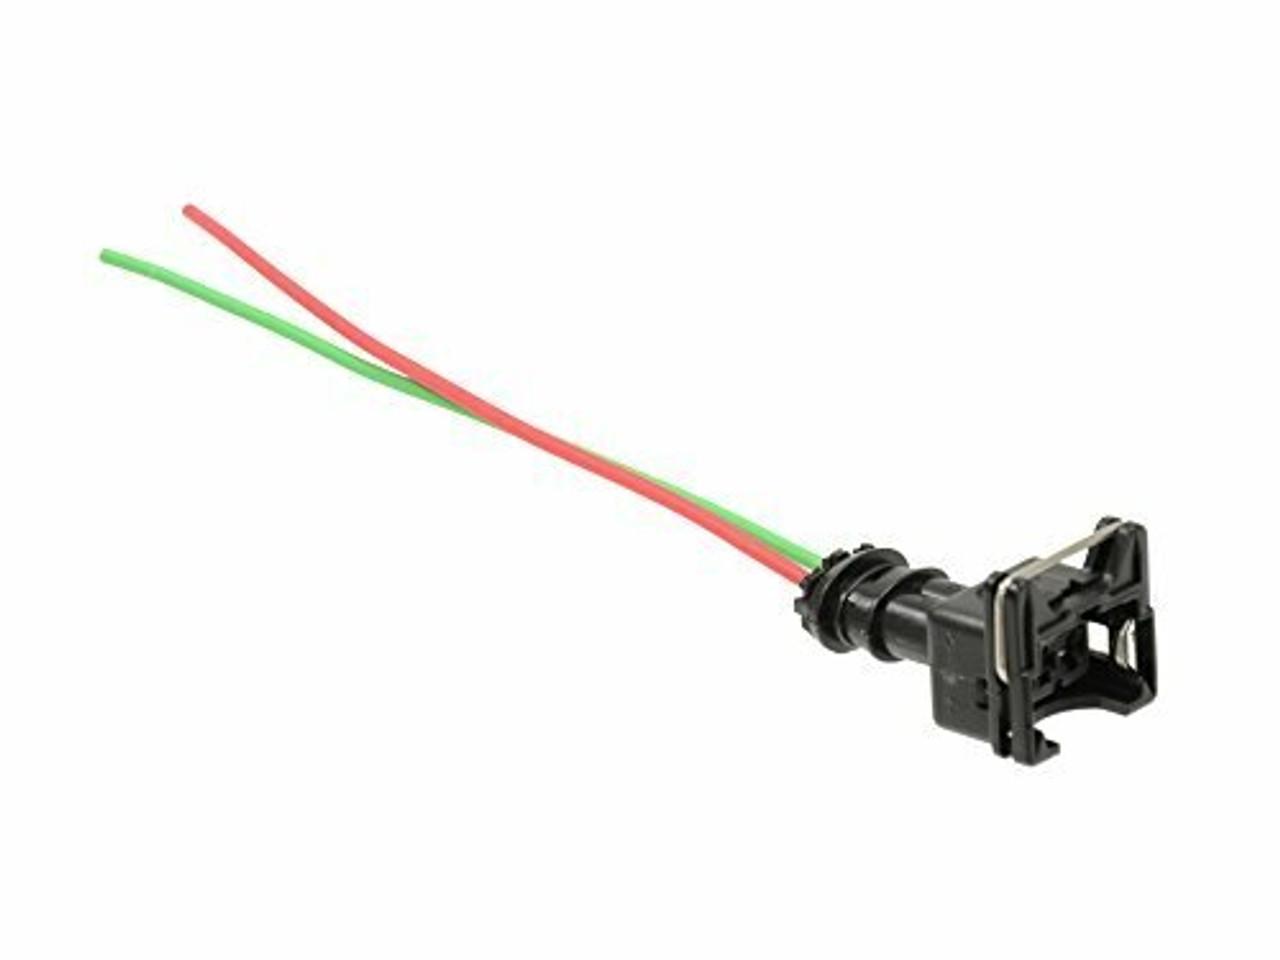 Incredible Ev1 Fuel Injector Connectors Fits Bosch Bmw Volvo Vw Porsche Gm Obd1 Wiring 101 Mentrastrewellnesstrialsorg